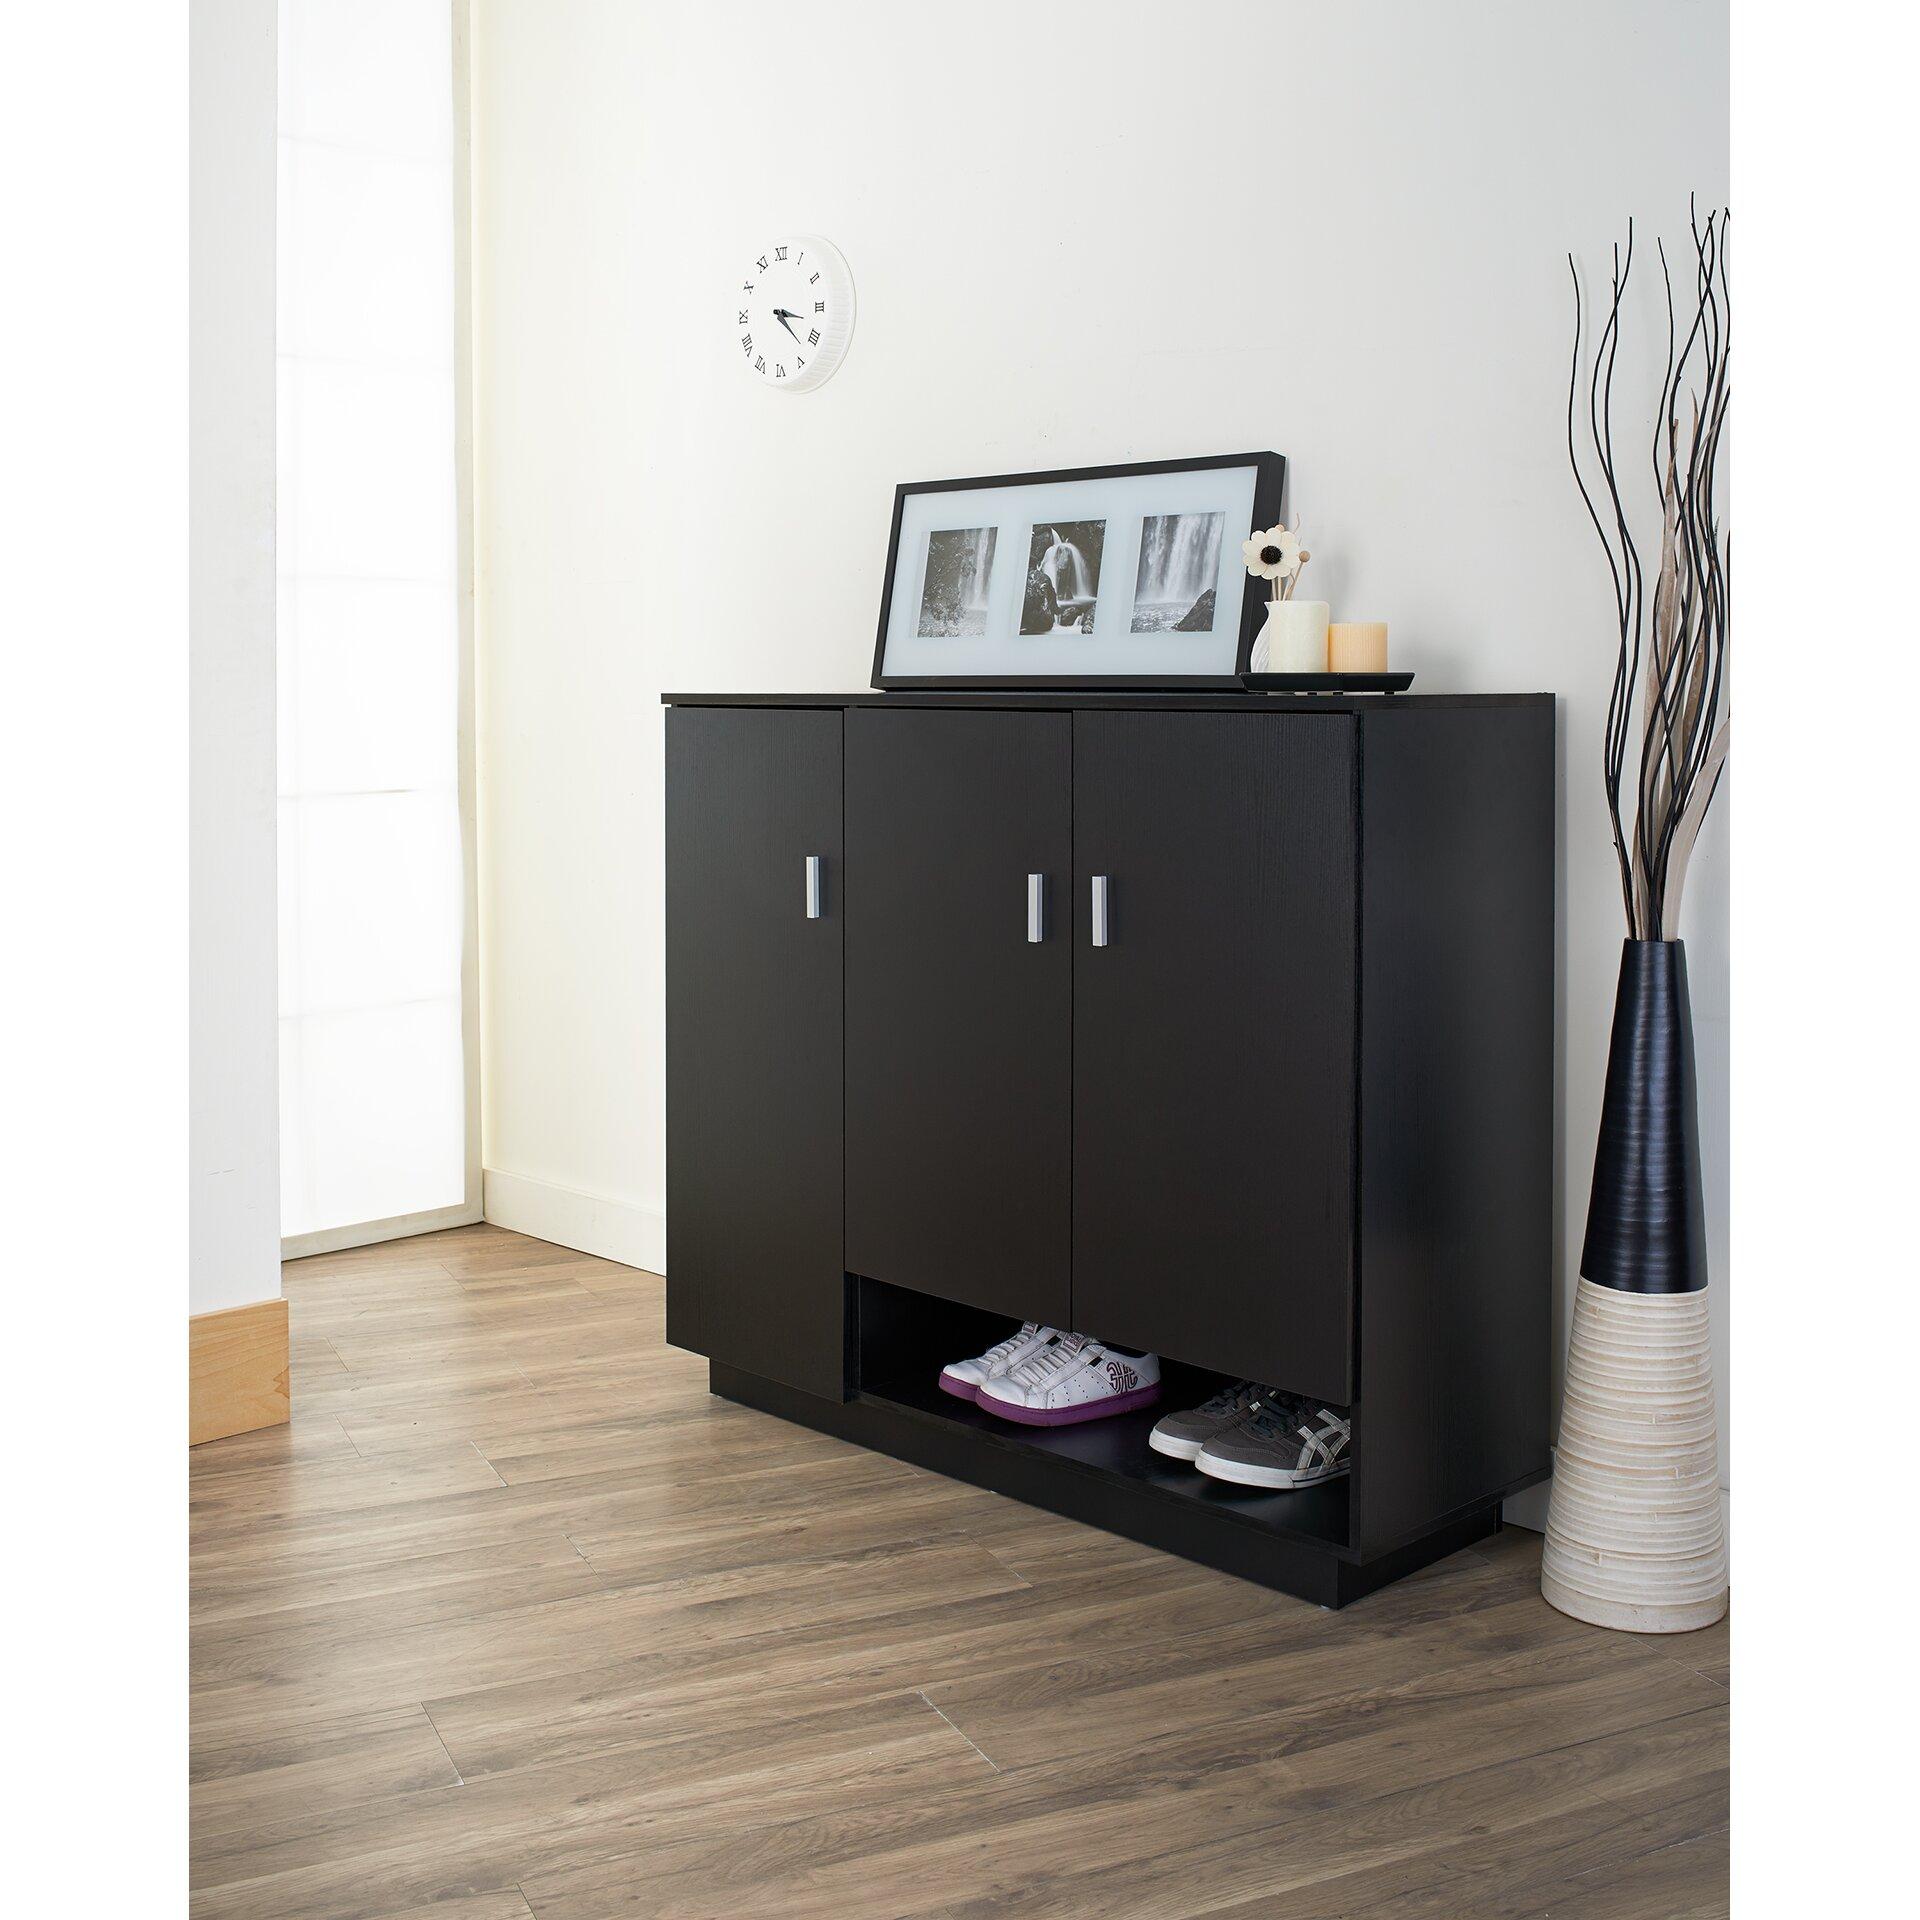 Hokku Designs Dominica 15 Pair Shoe Storage Cabinet Reviews